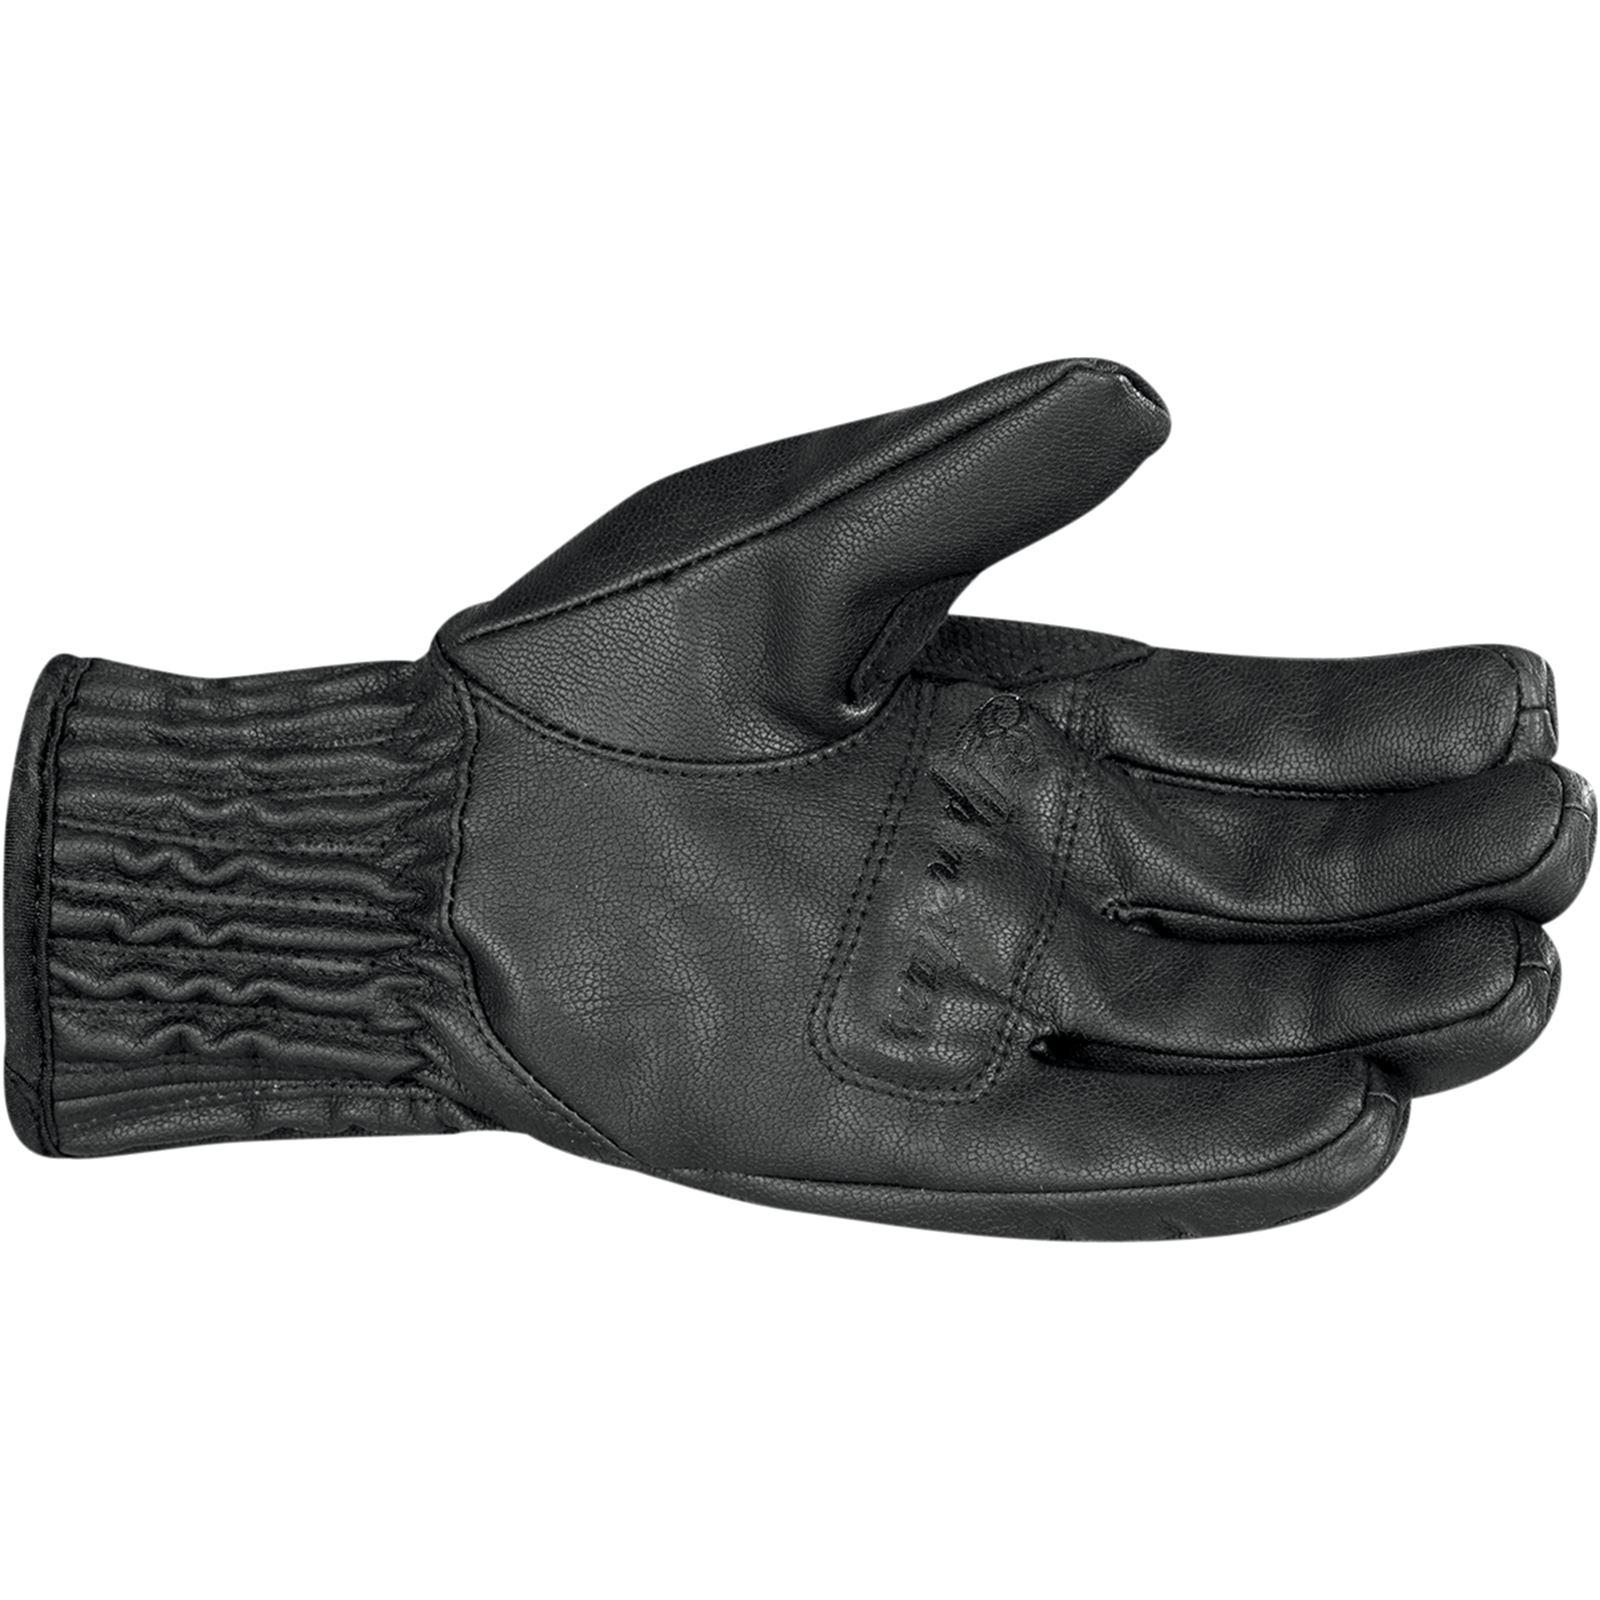 Alpinestars Women's Munich Drystar® Gloves - Black -Small